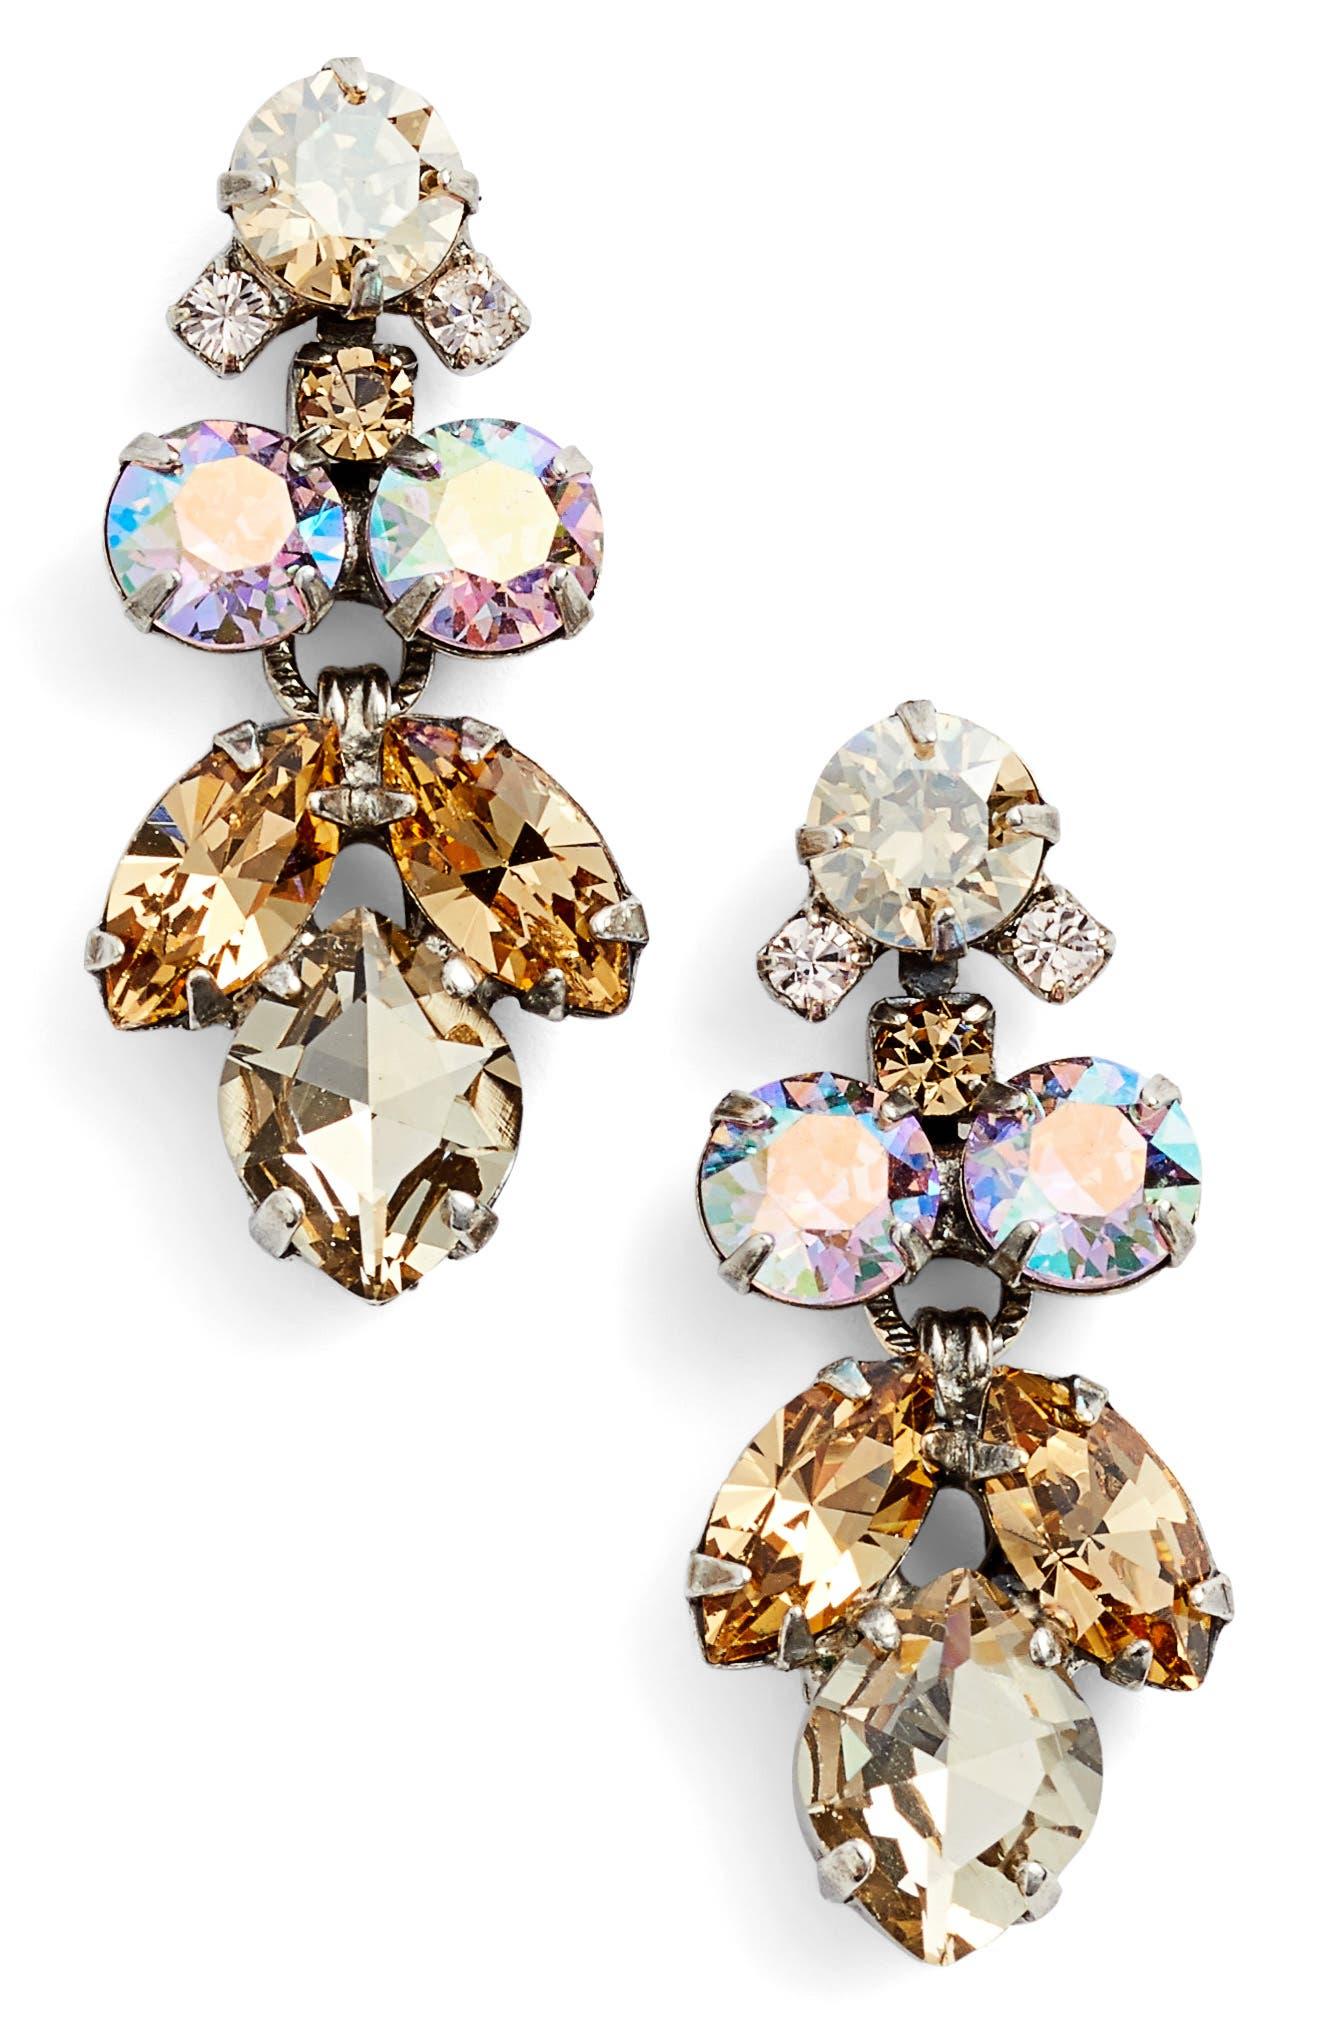 Petite Crystal Lotus Flower Drop Earrings,                             Main thumbnail 1, color,                             Tan